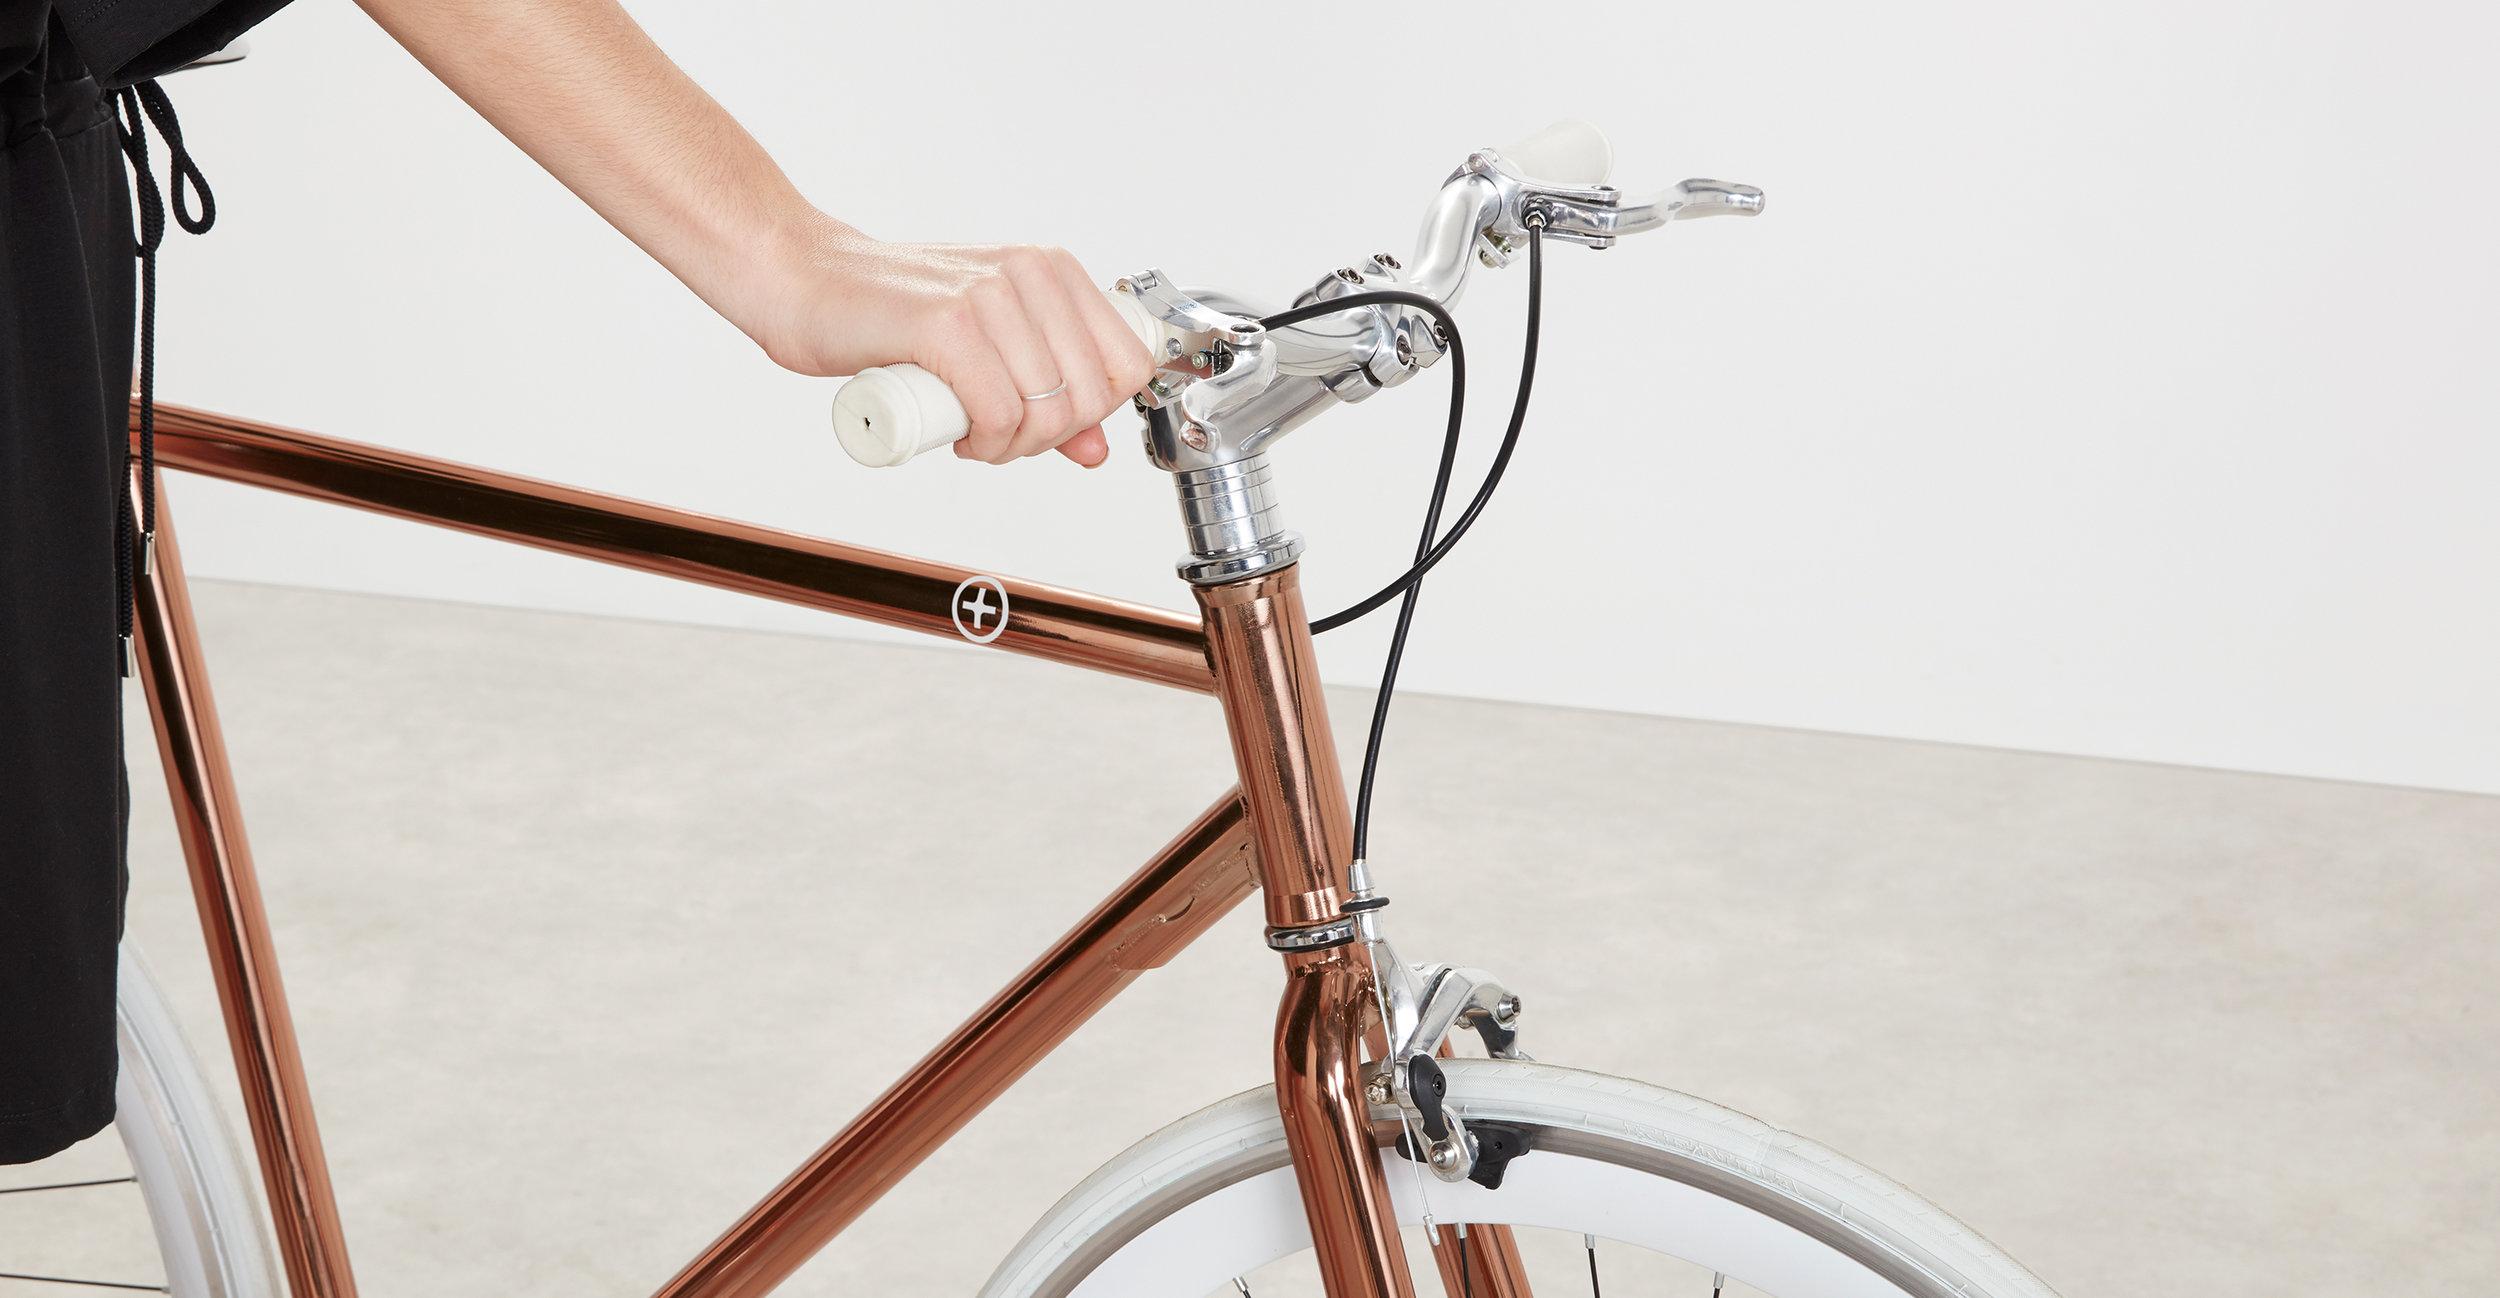 BIKMLW001COP-UK_Mallow_Single_Speed_City_Bike_Copper_White_SM_LB03.jpg